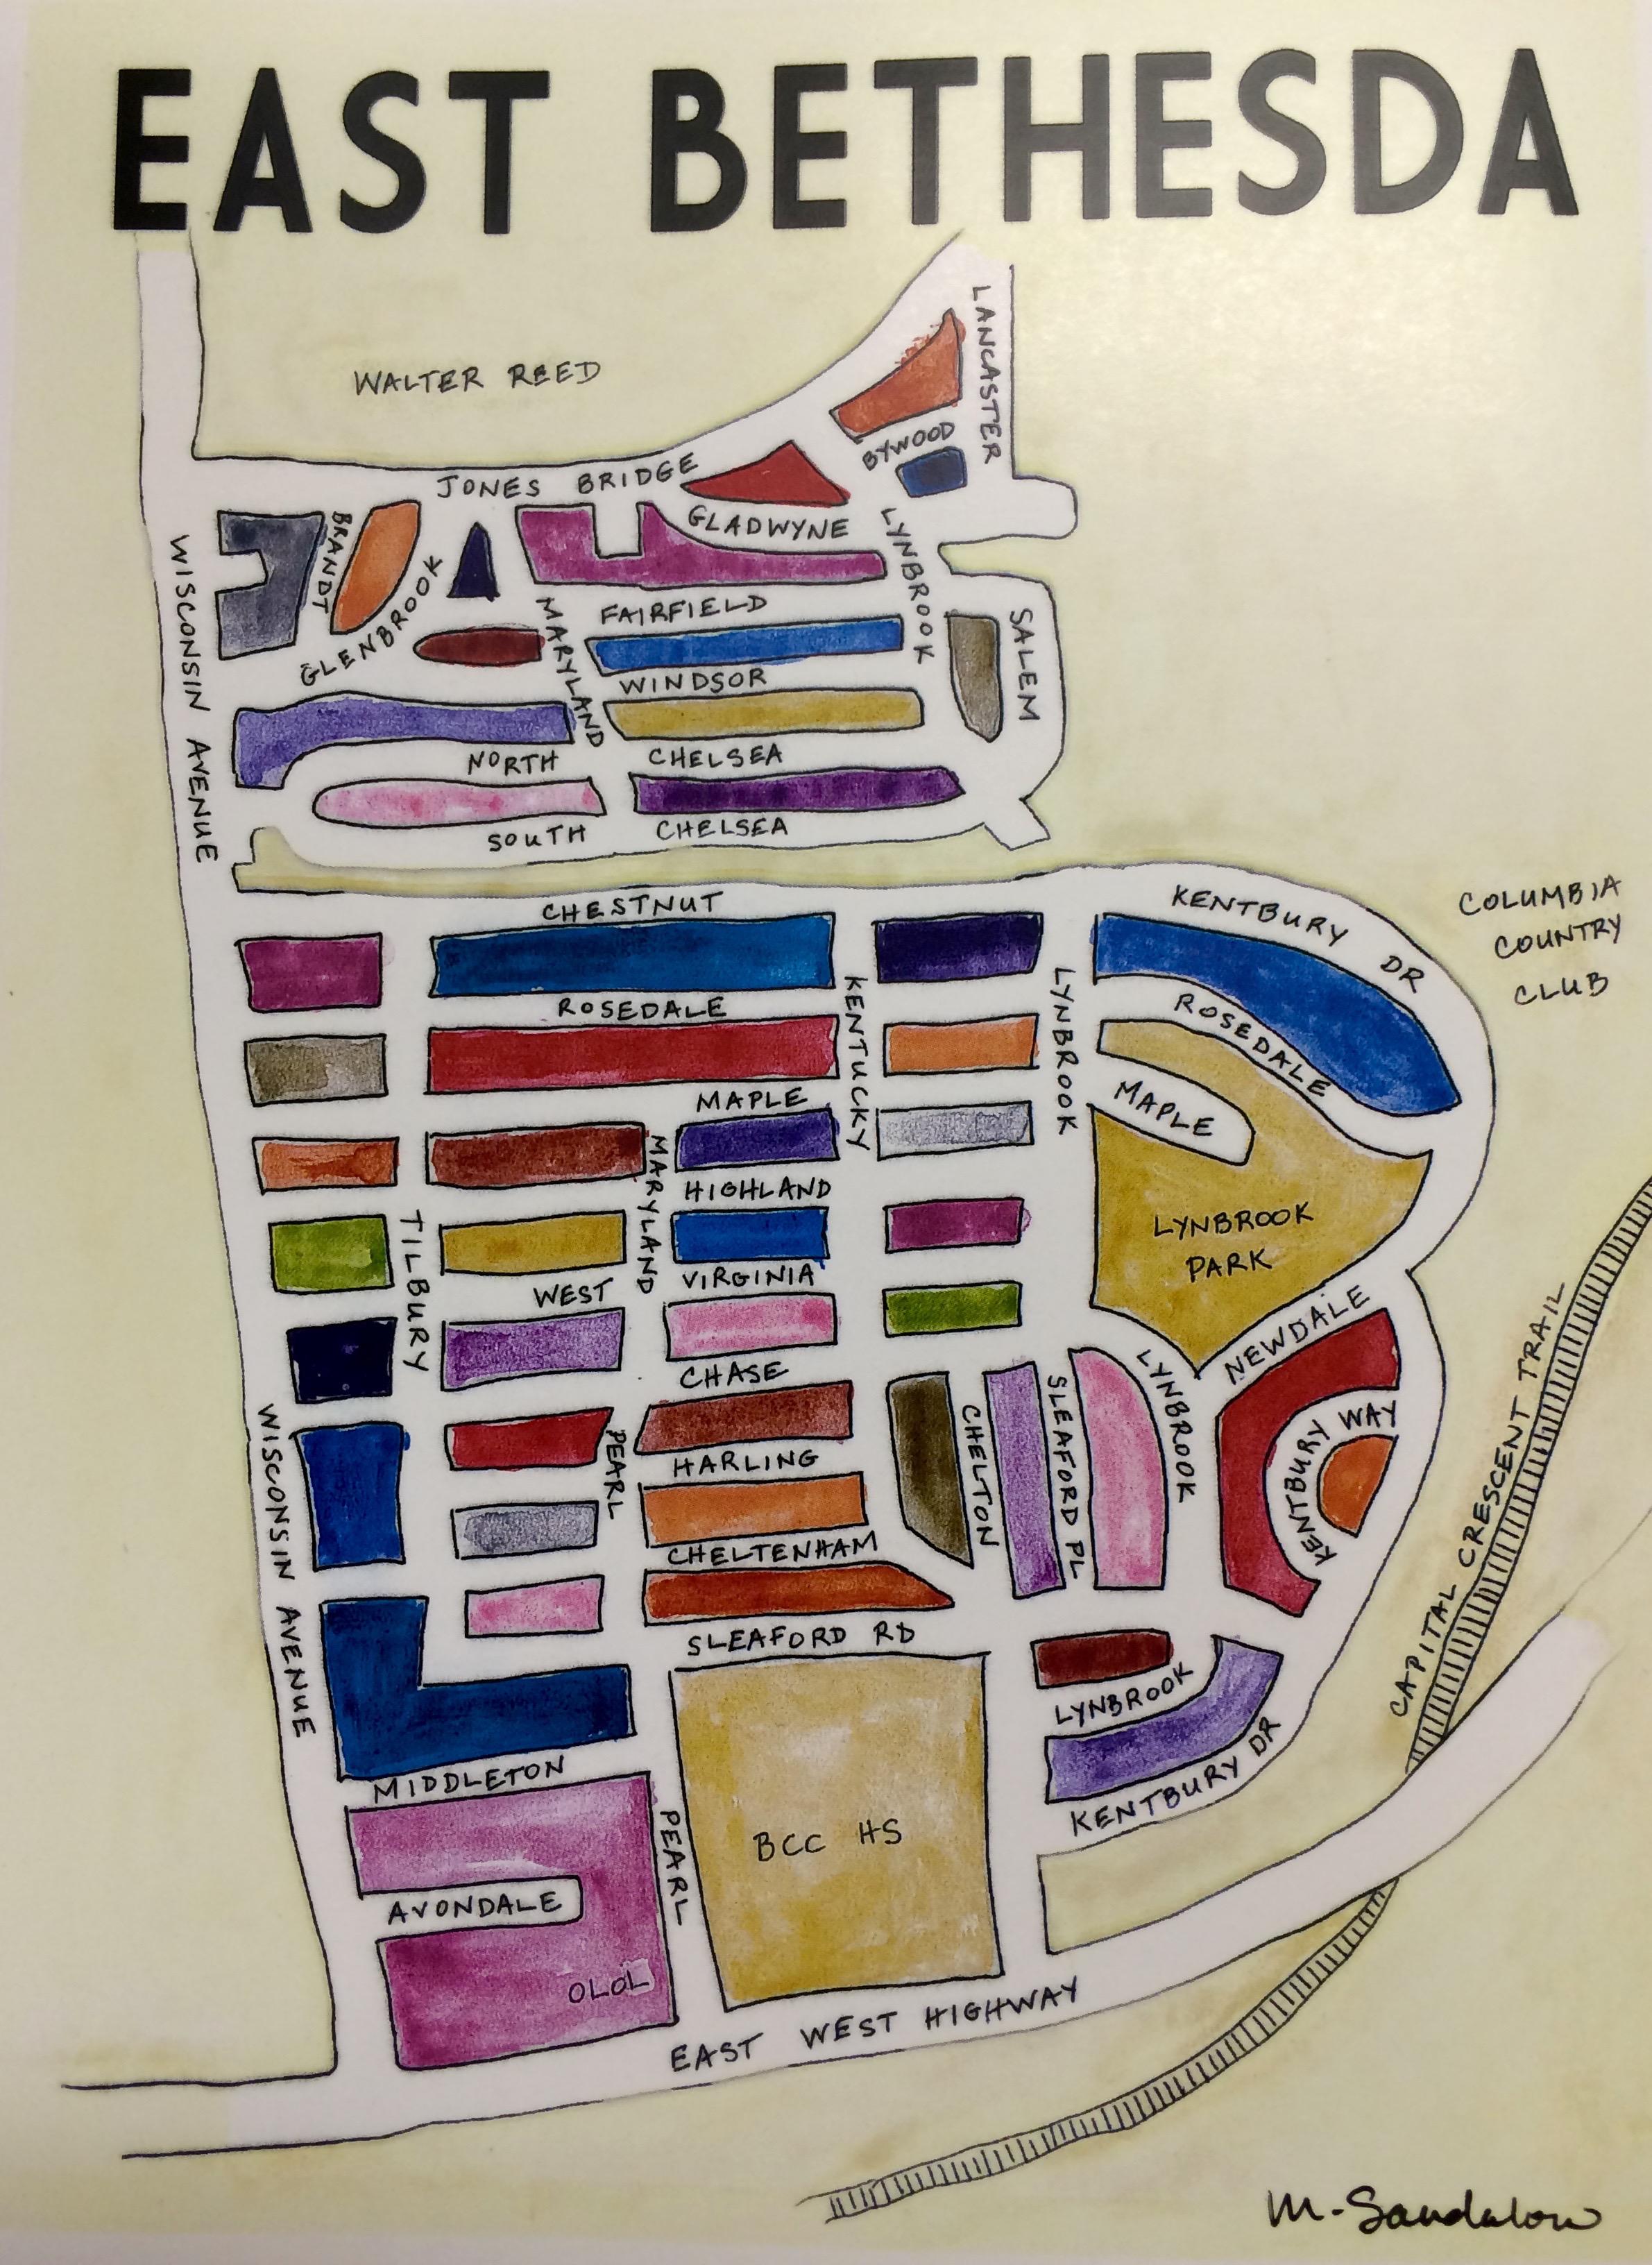 East Bethesda Map